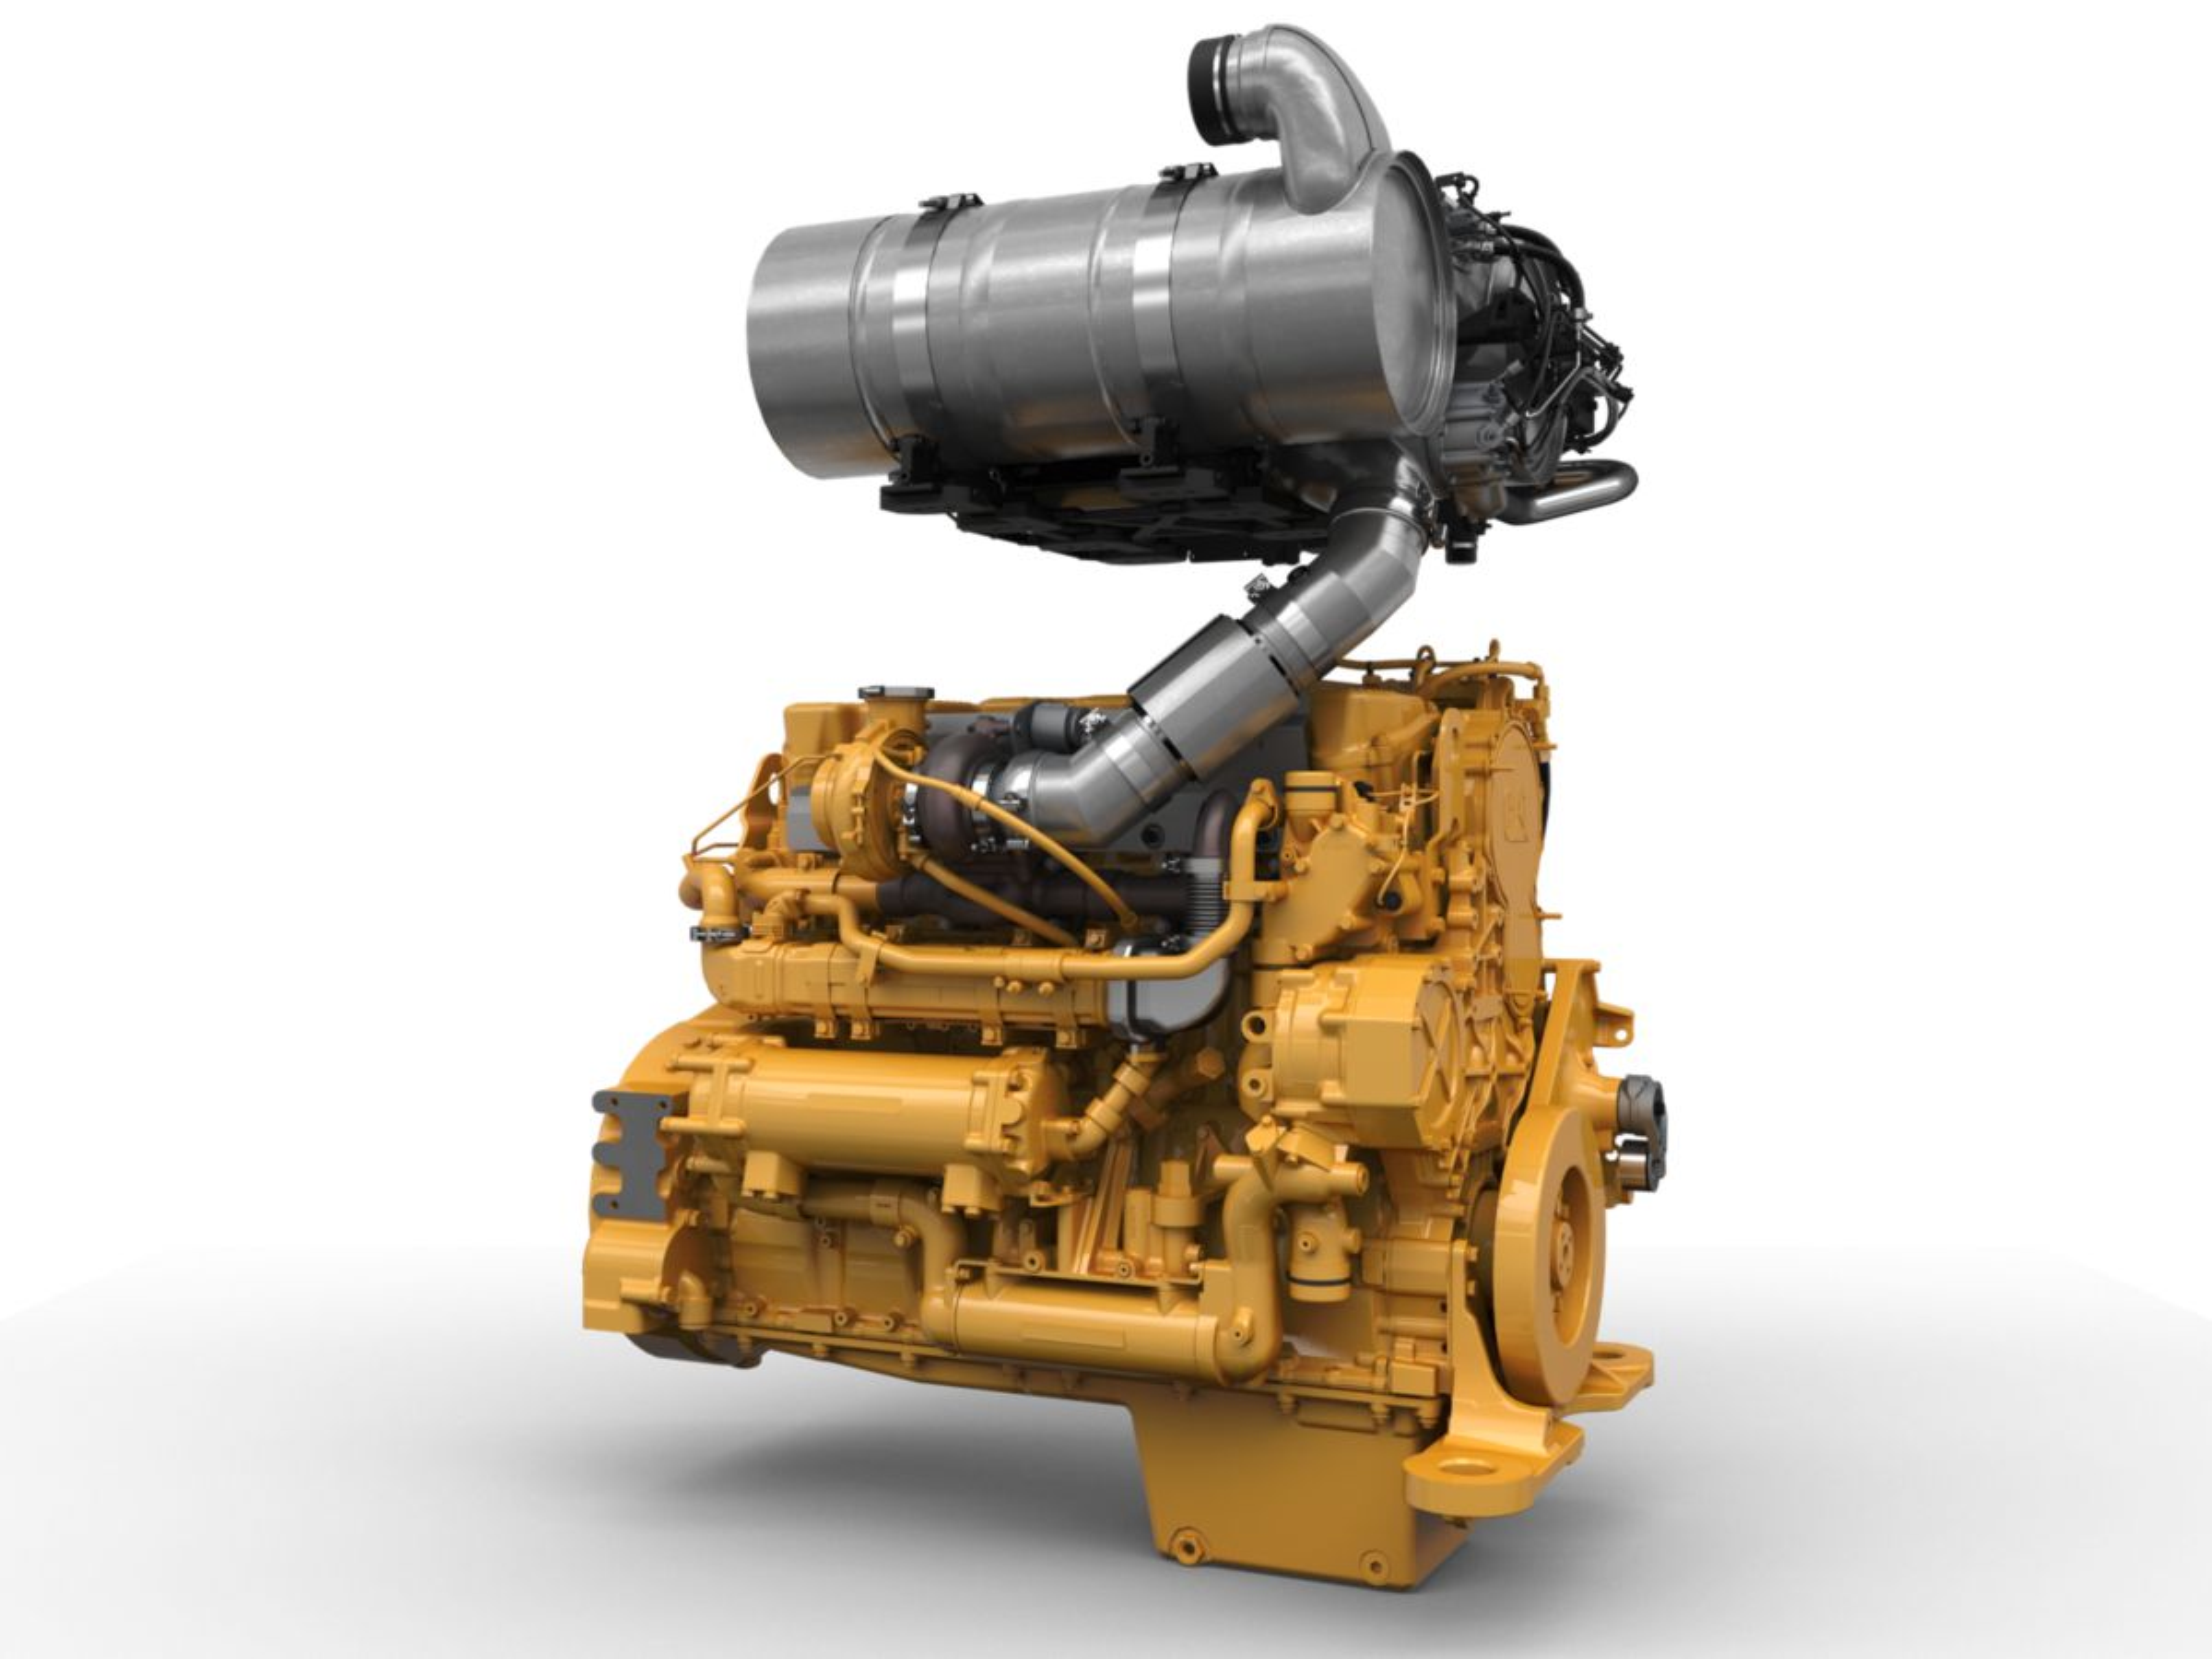 C15 ACERT™ Tier 4 Final Petroleum Engine Well Servicing Engines